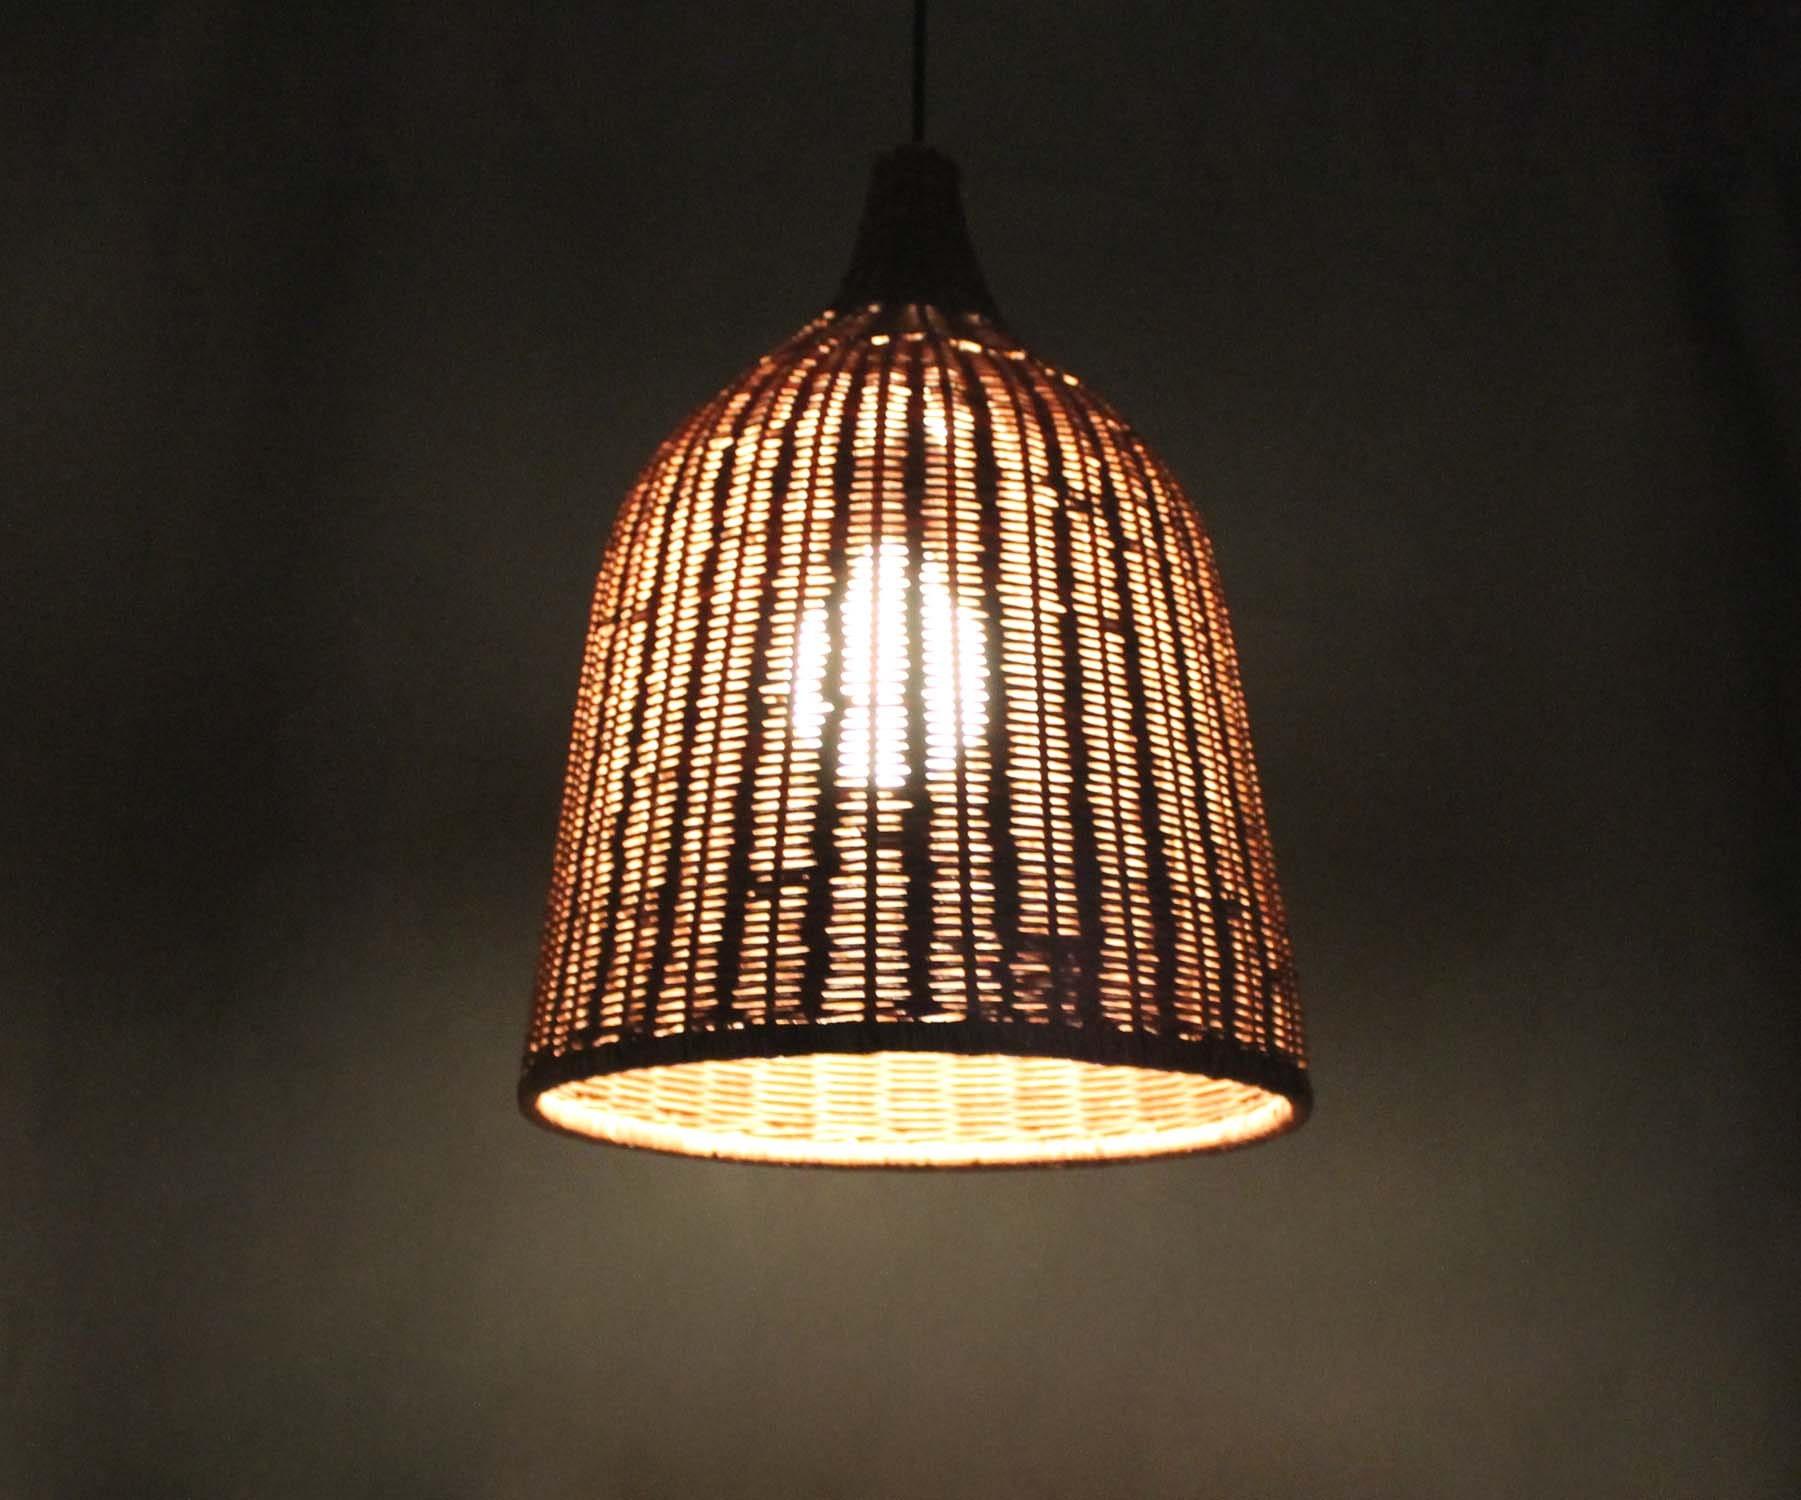 Brown Basket Rattan Pendant Light  Vintage Lighting  Brown